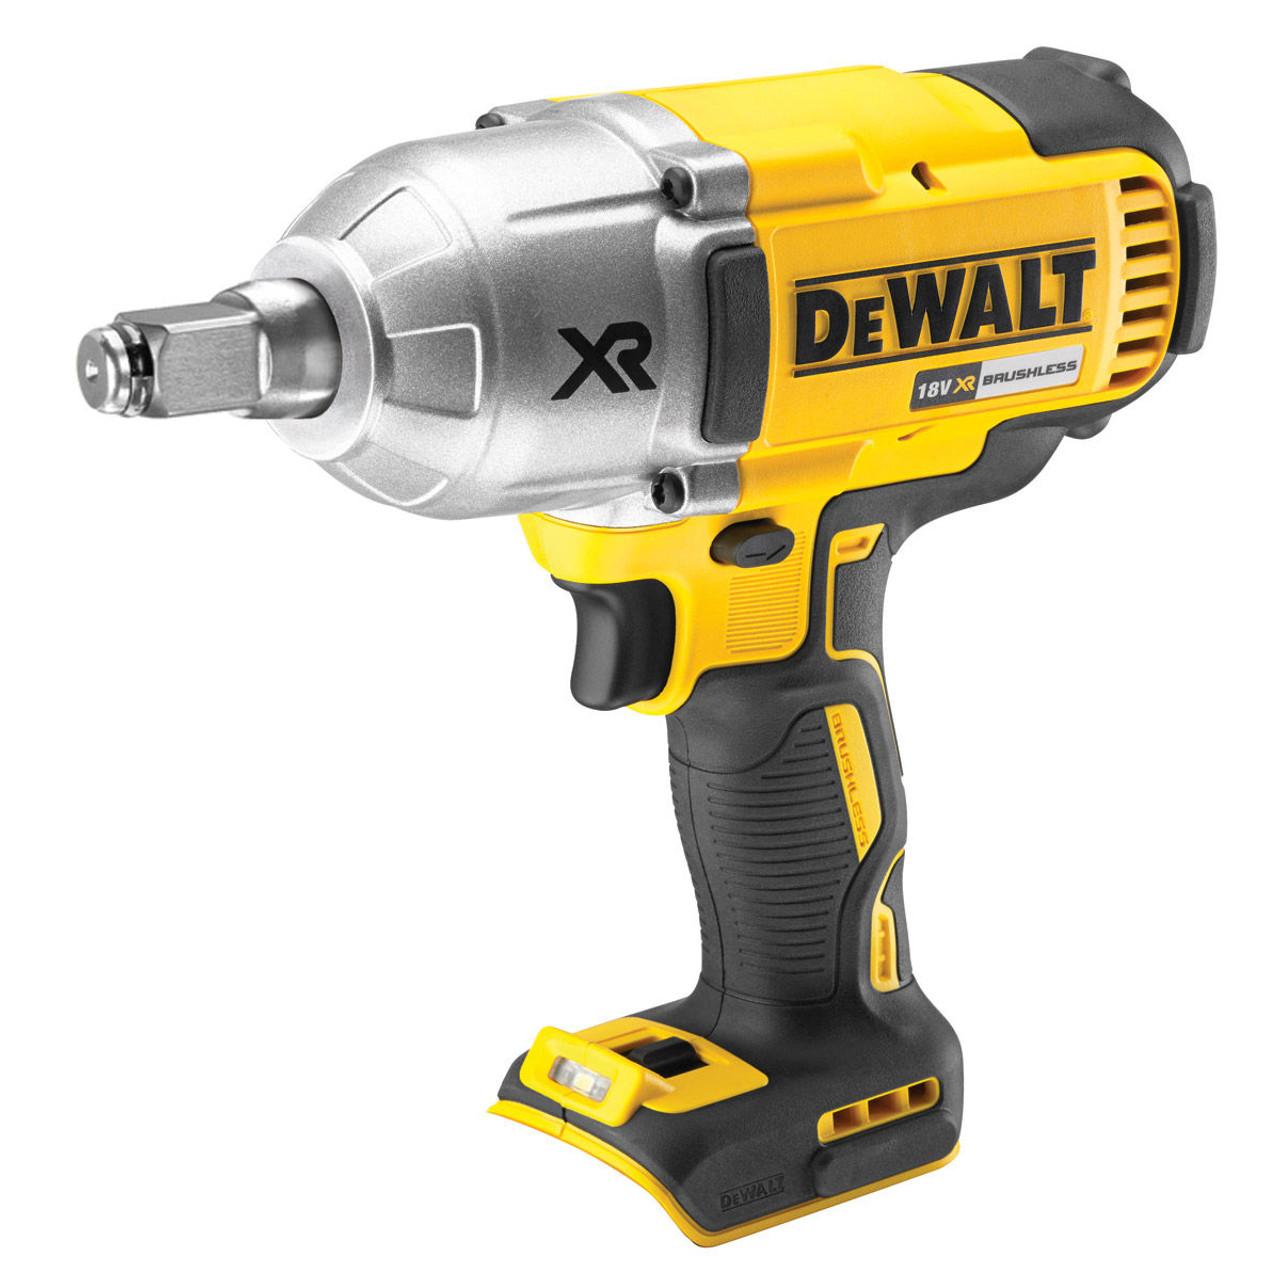 DEWALT DCF897N 18V XR 3/4in High Torque Impact Wrench Bare